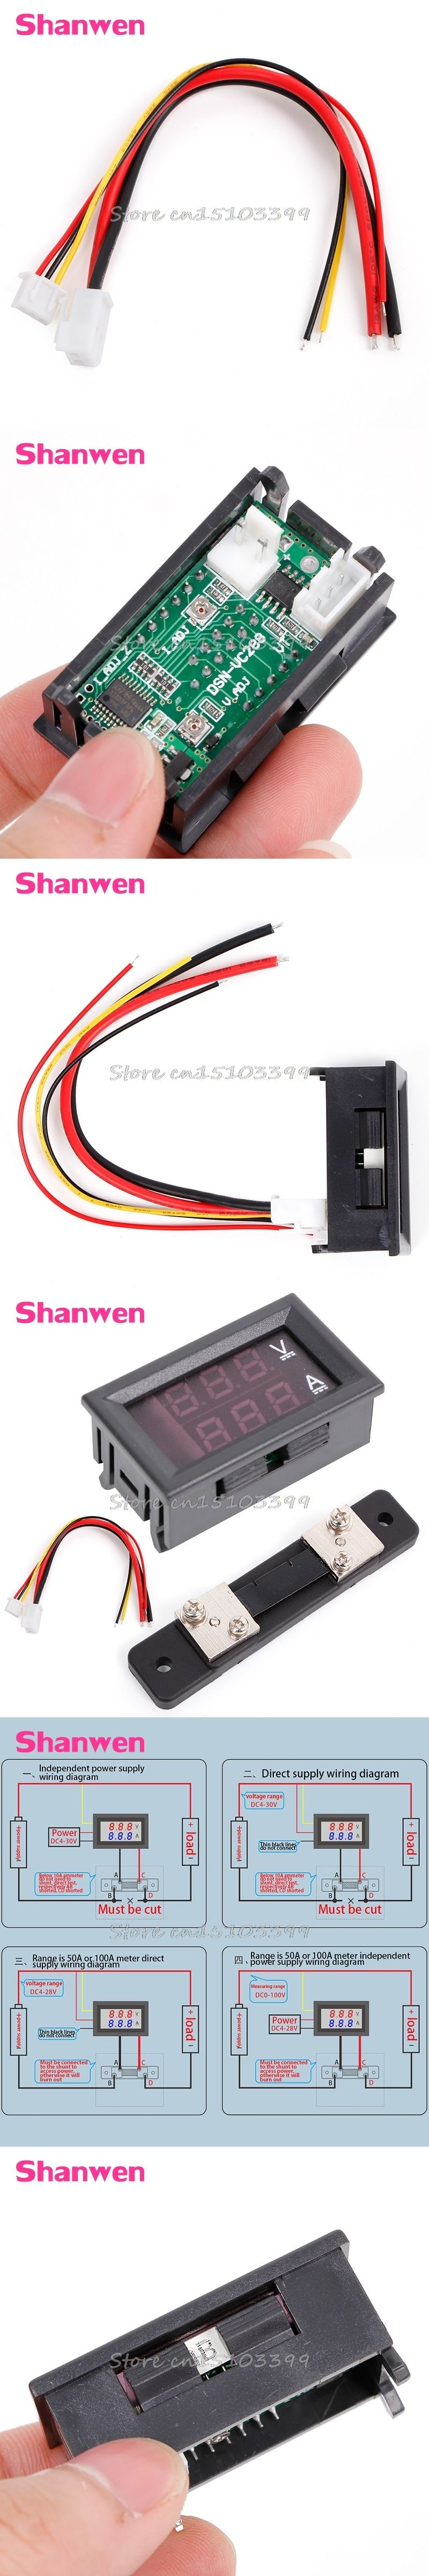 Digital Volt Amp Meter Wiring Diagram Library Ammeter Circuit 0 100v 50a Red Blue Voltmeter 2in1 Dc W